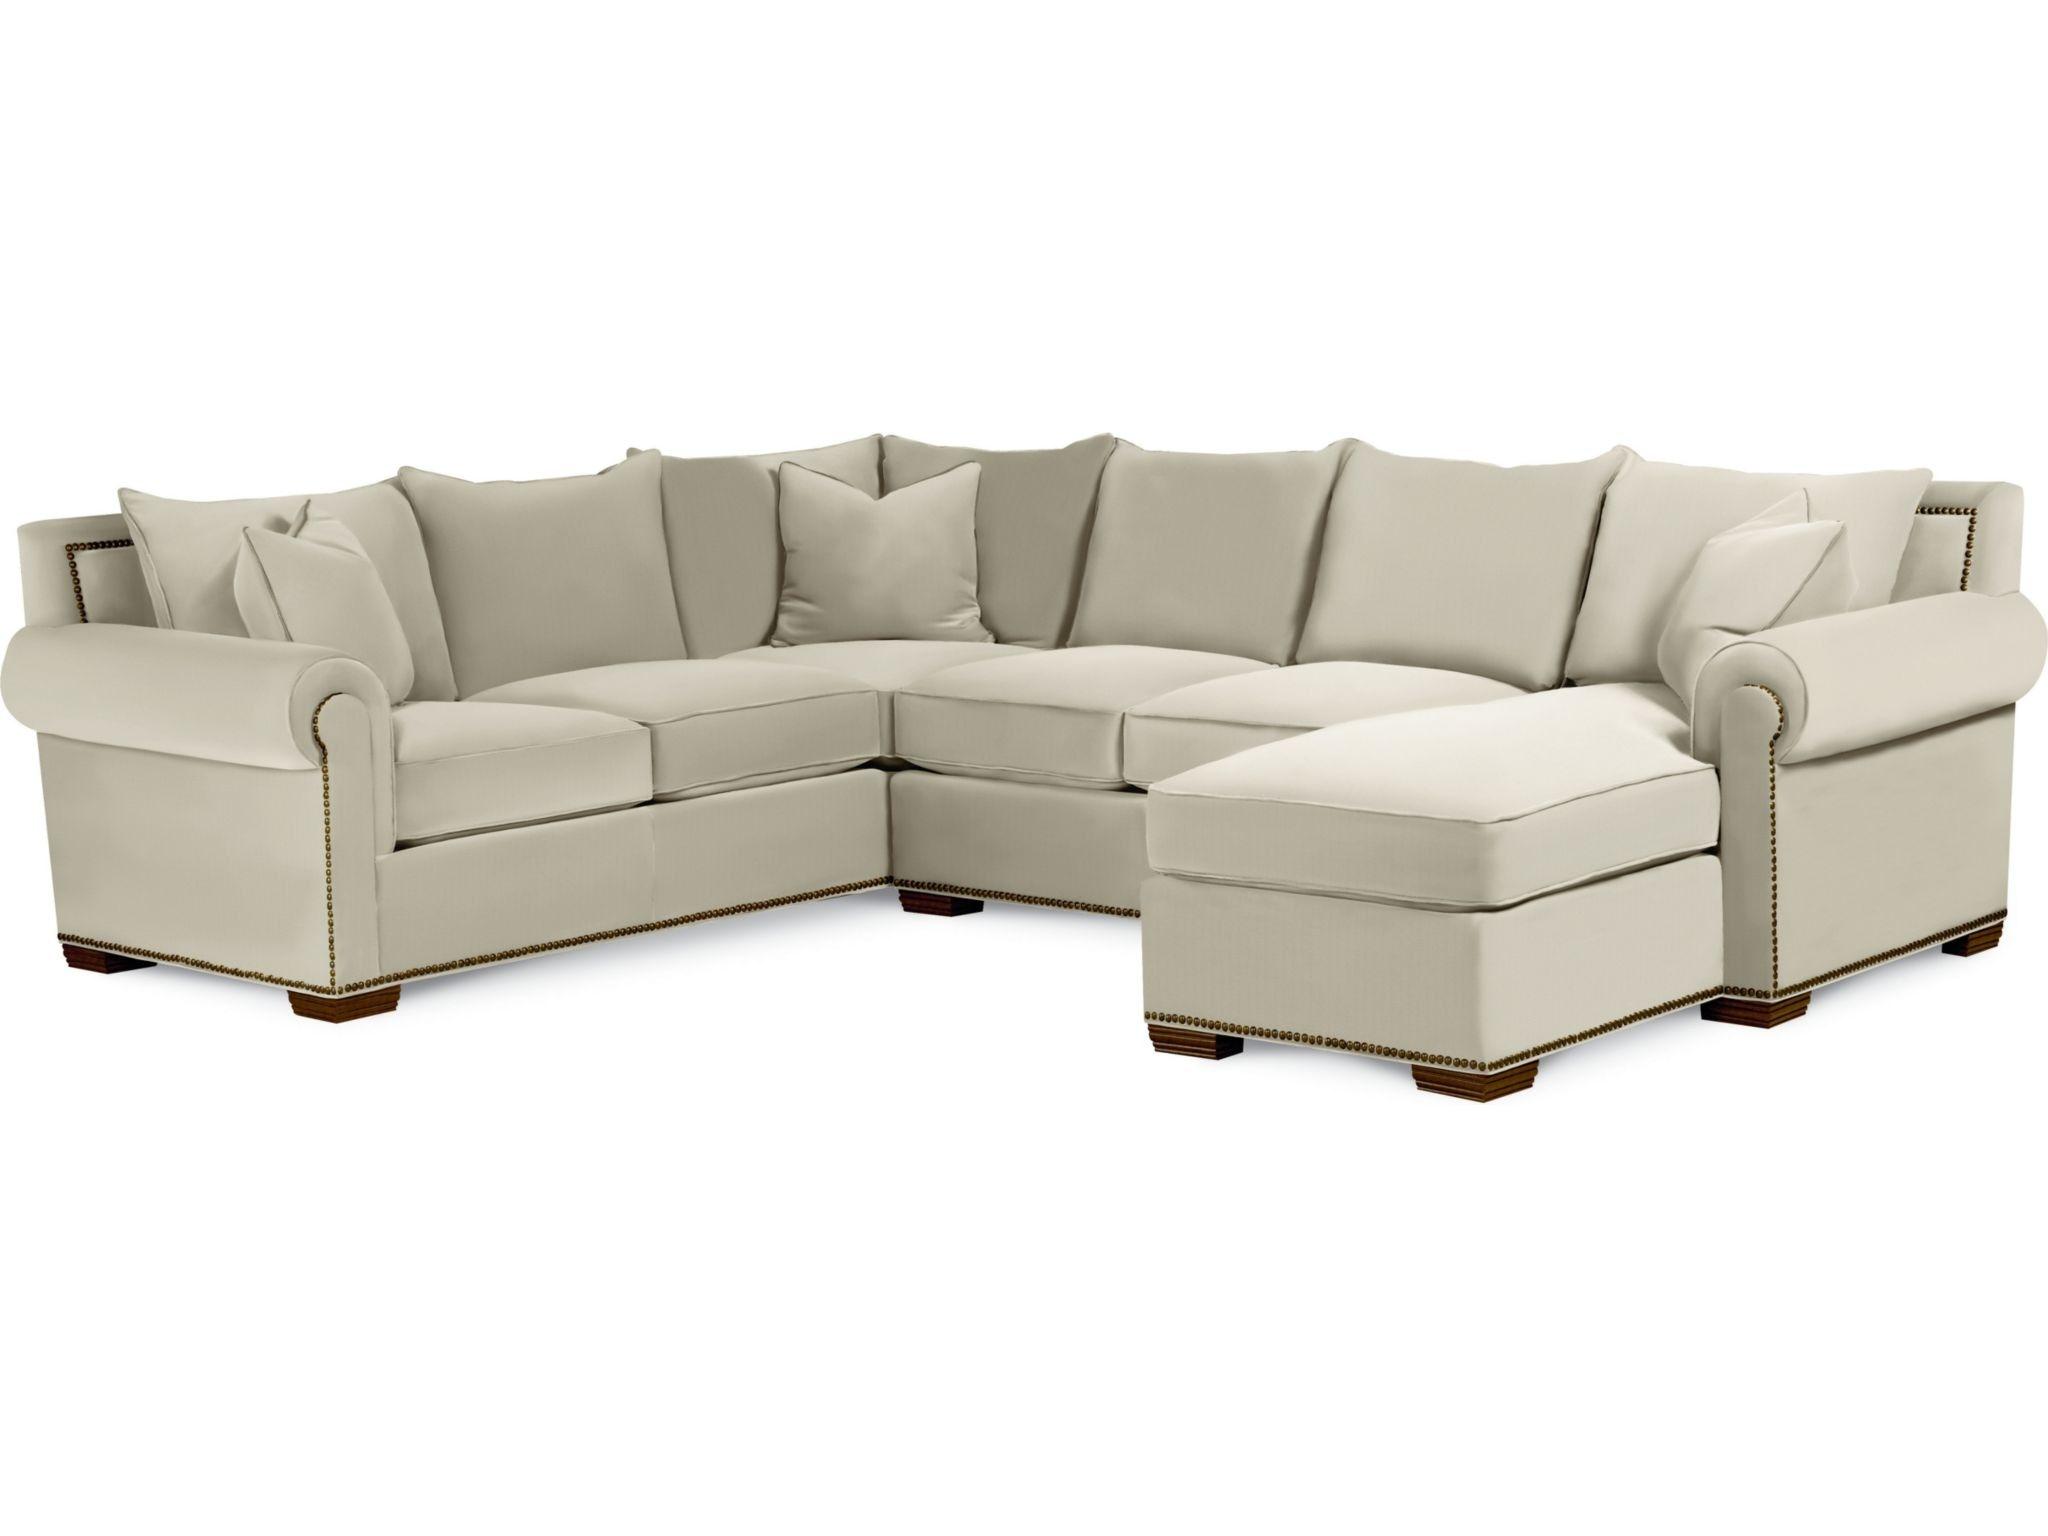 Thomasville Living Room Fremont Sectional 1658 SECT   Bacons Furniture   Port  Charlotte, FL